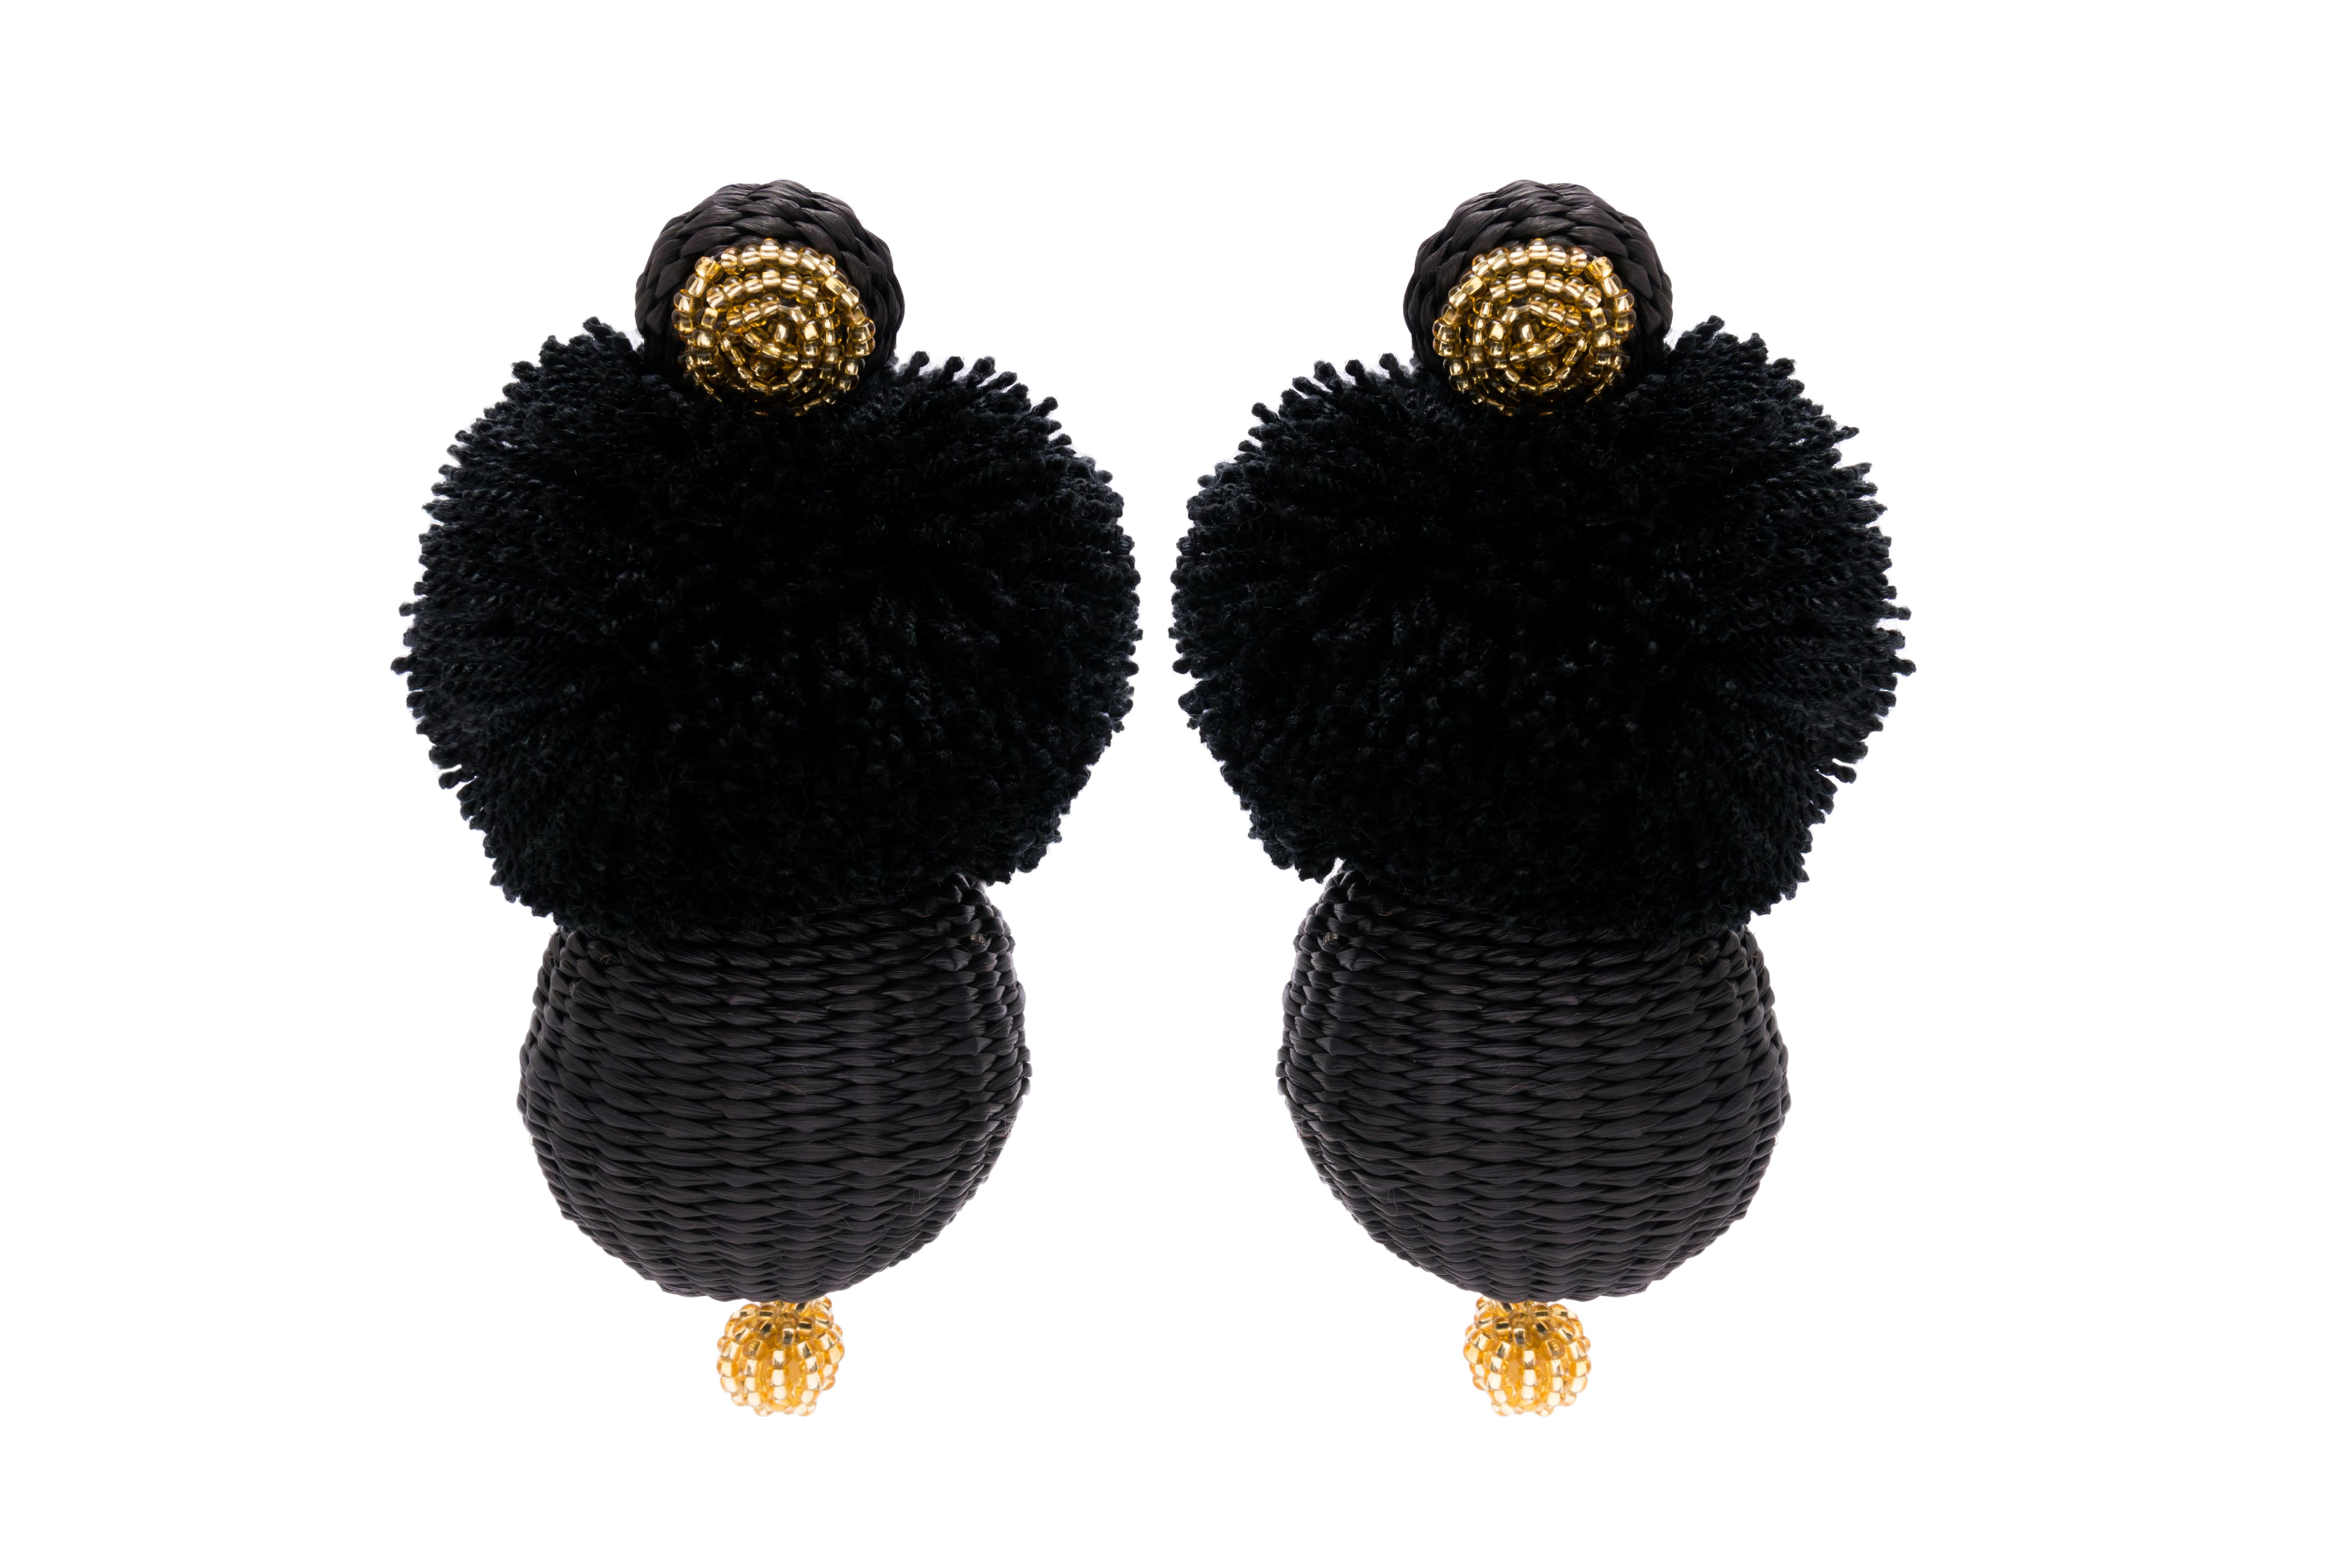 Frufru Earrings Black